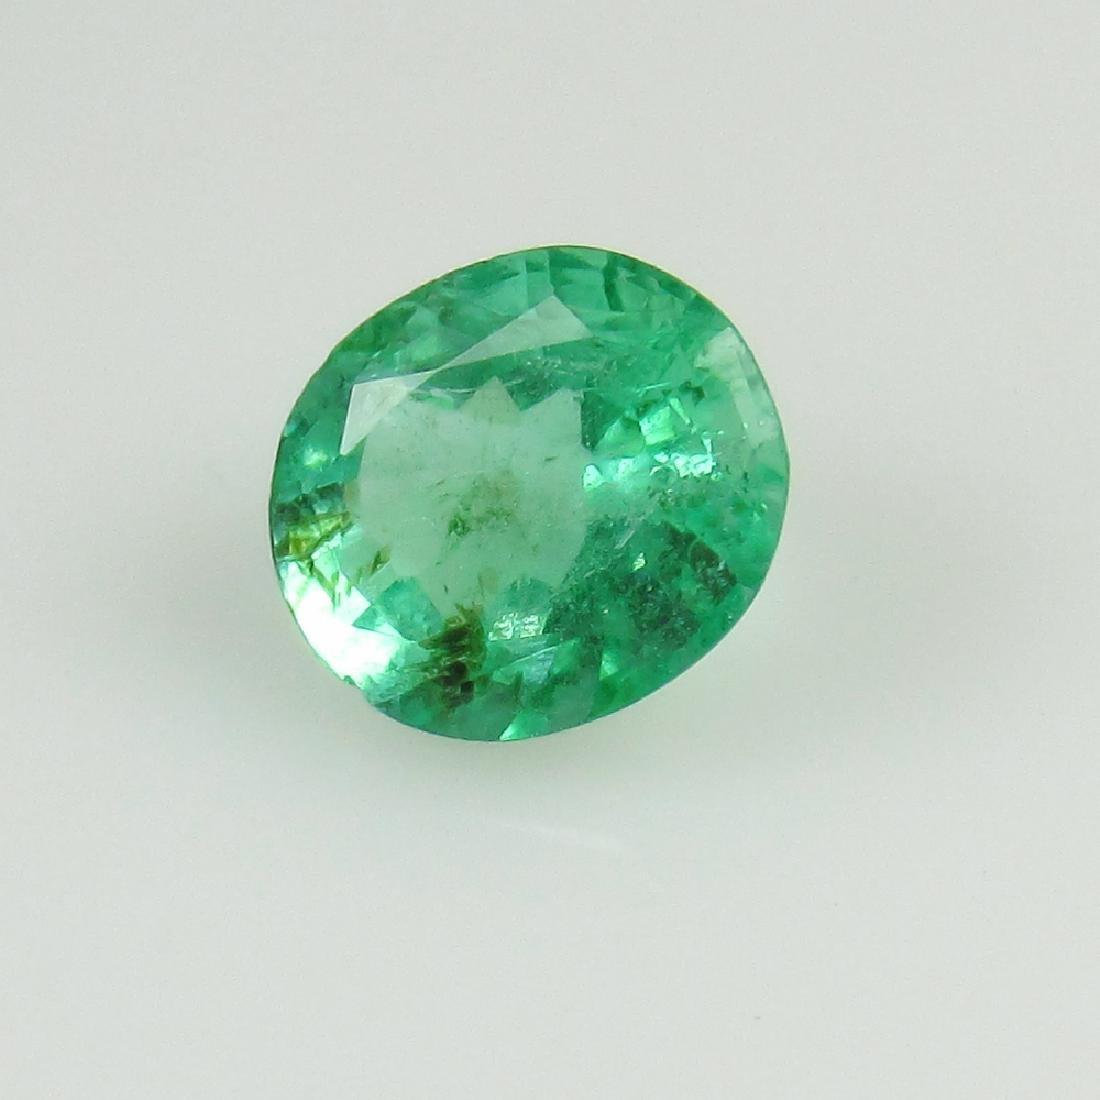 0.64 Ct Genuine Loose Zambian Emerald Nice Oval Cut - 2